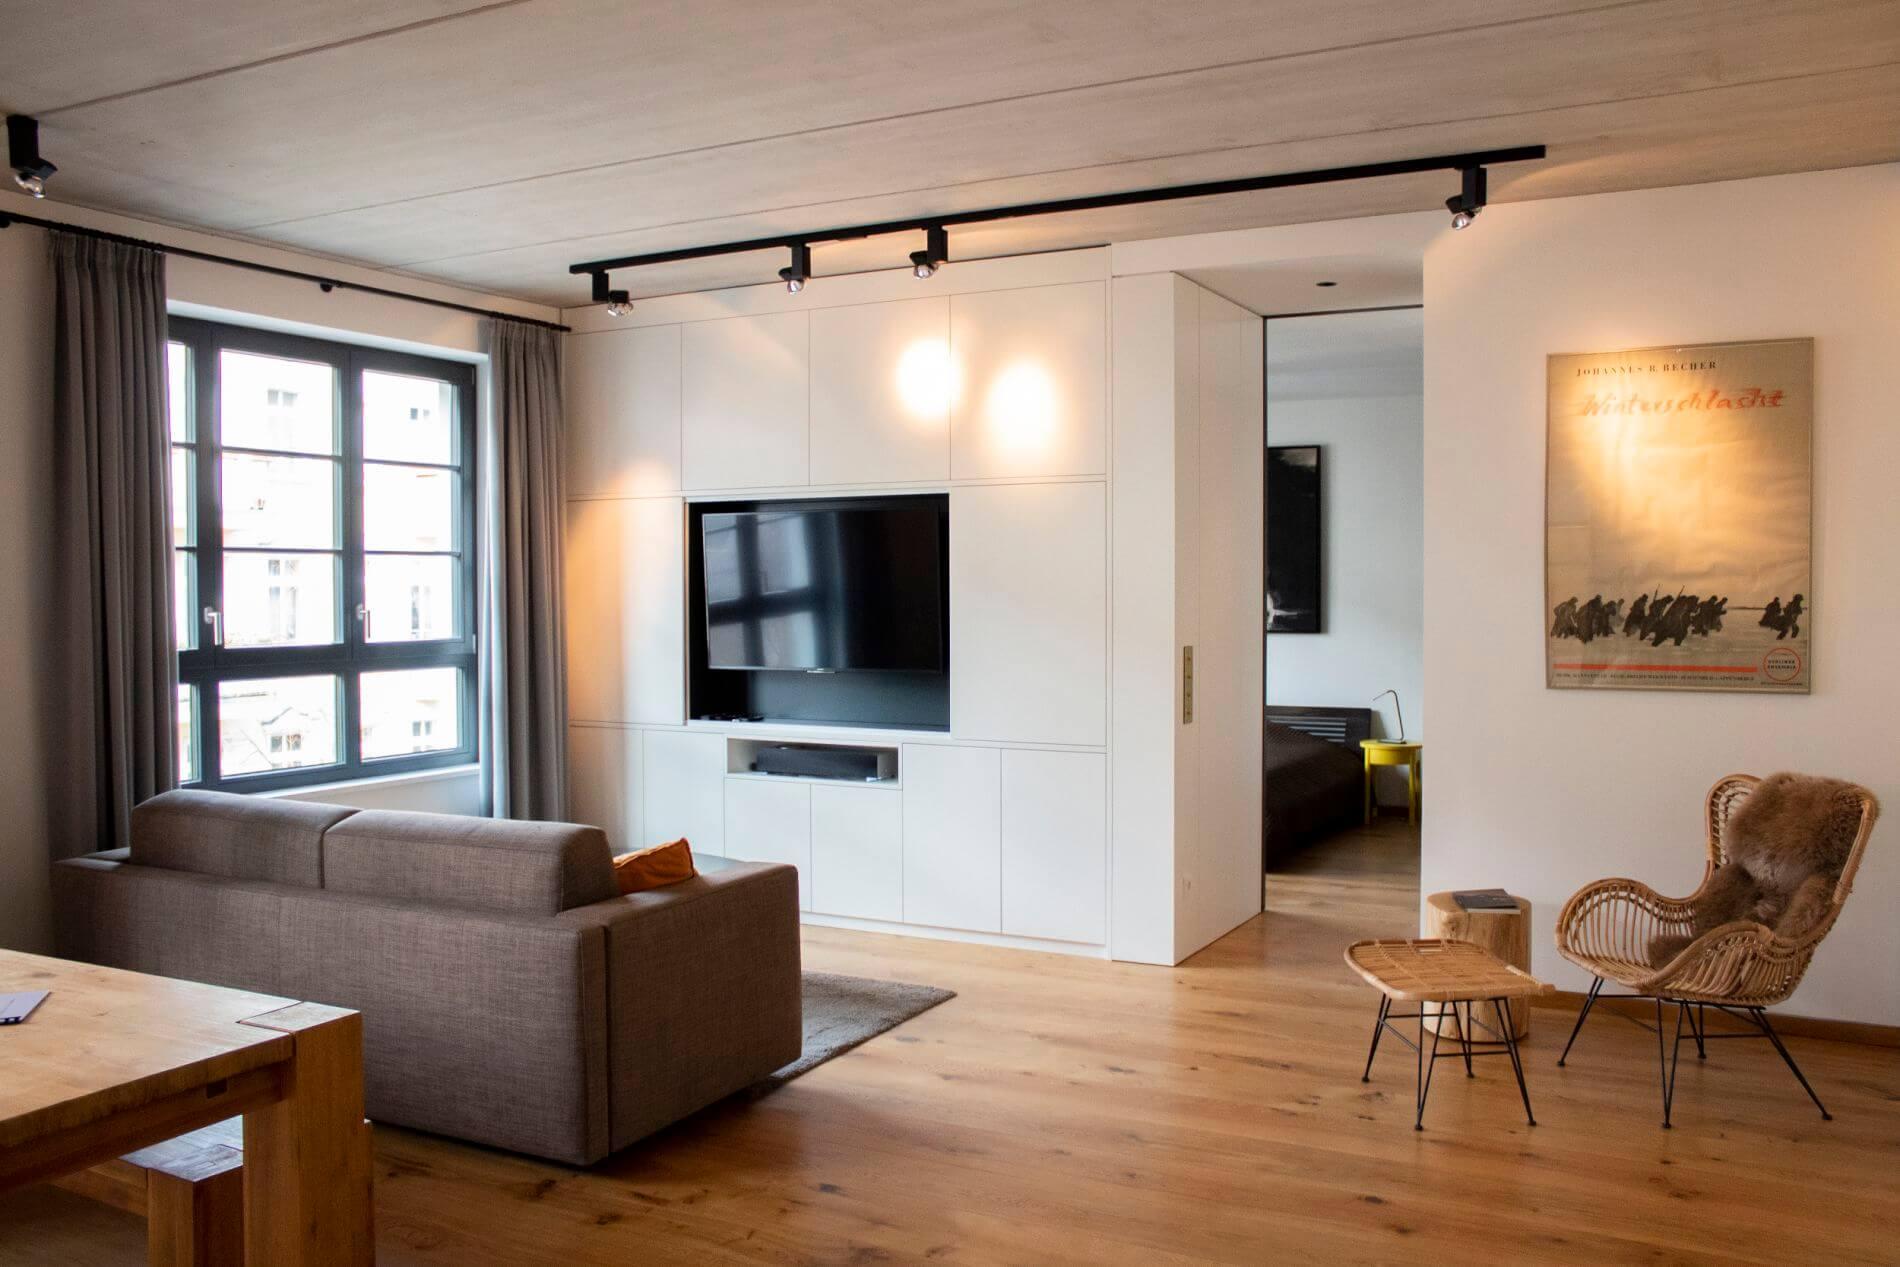 Budget-friendly luxury furnished apartment in Berlin Prenzlauer Berg